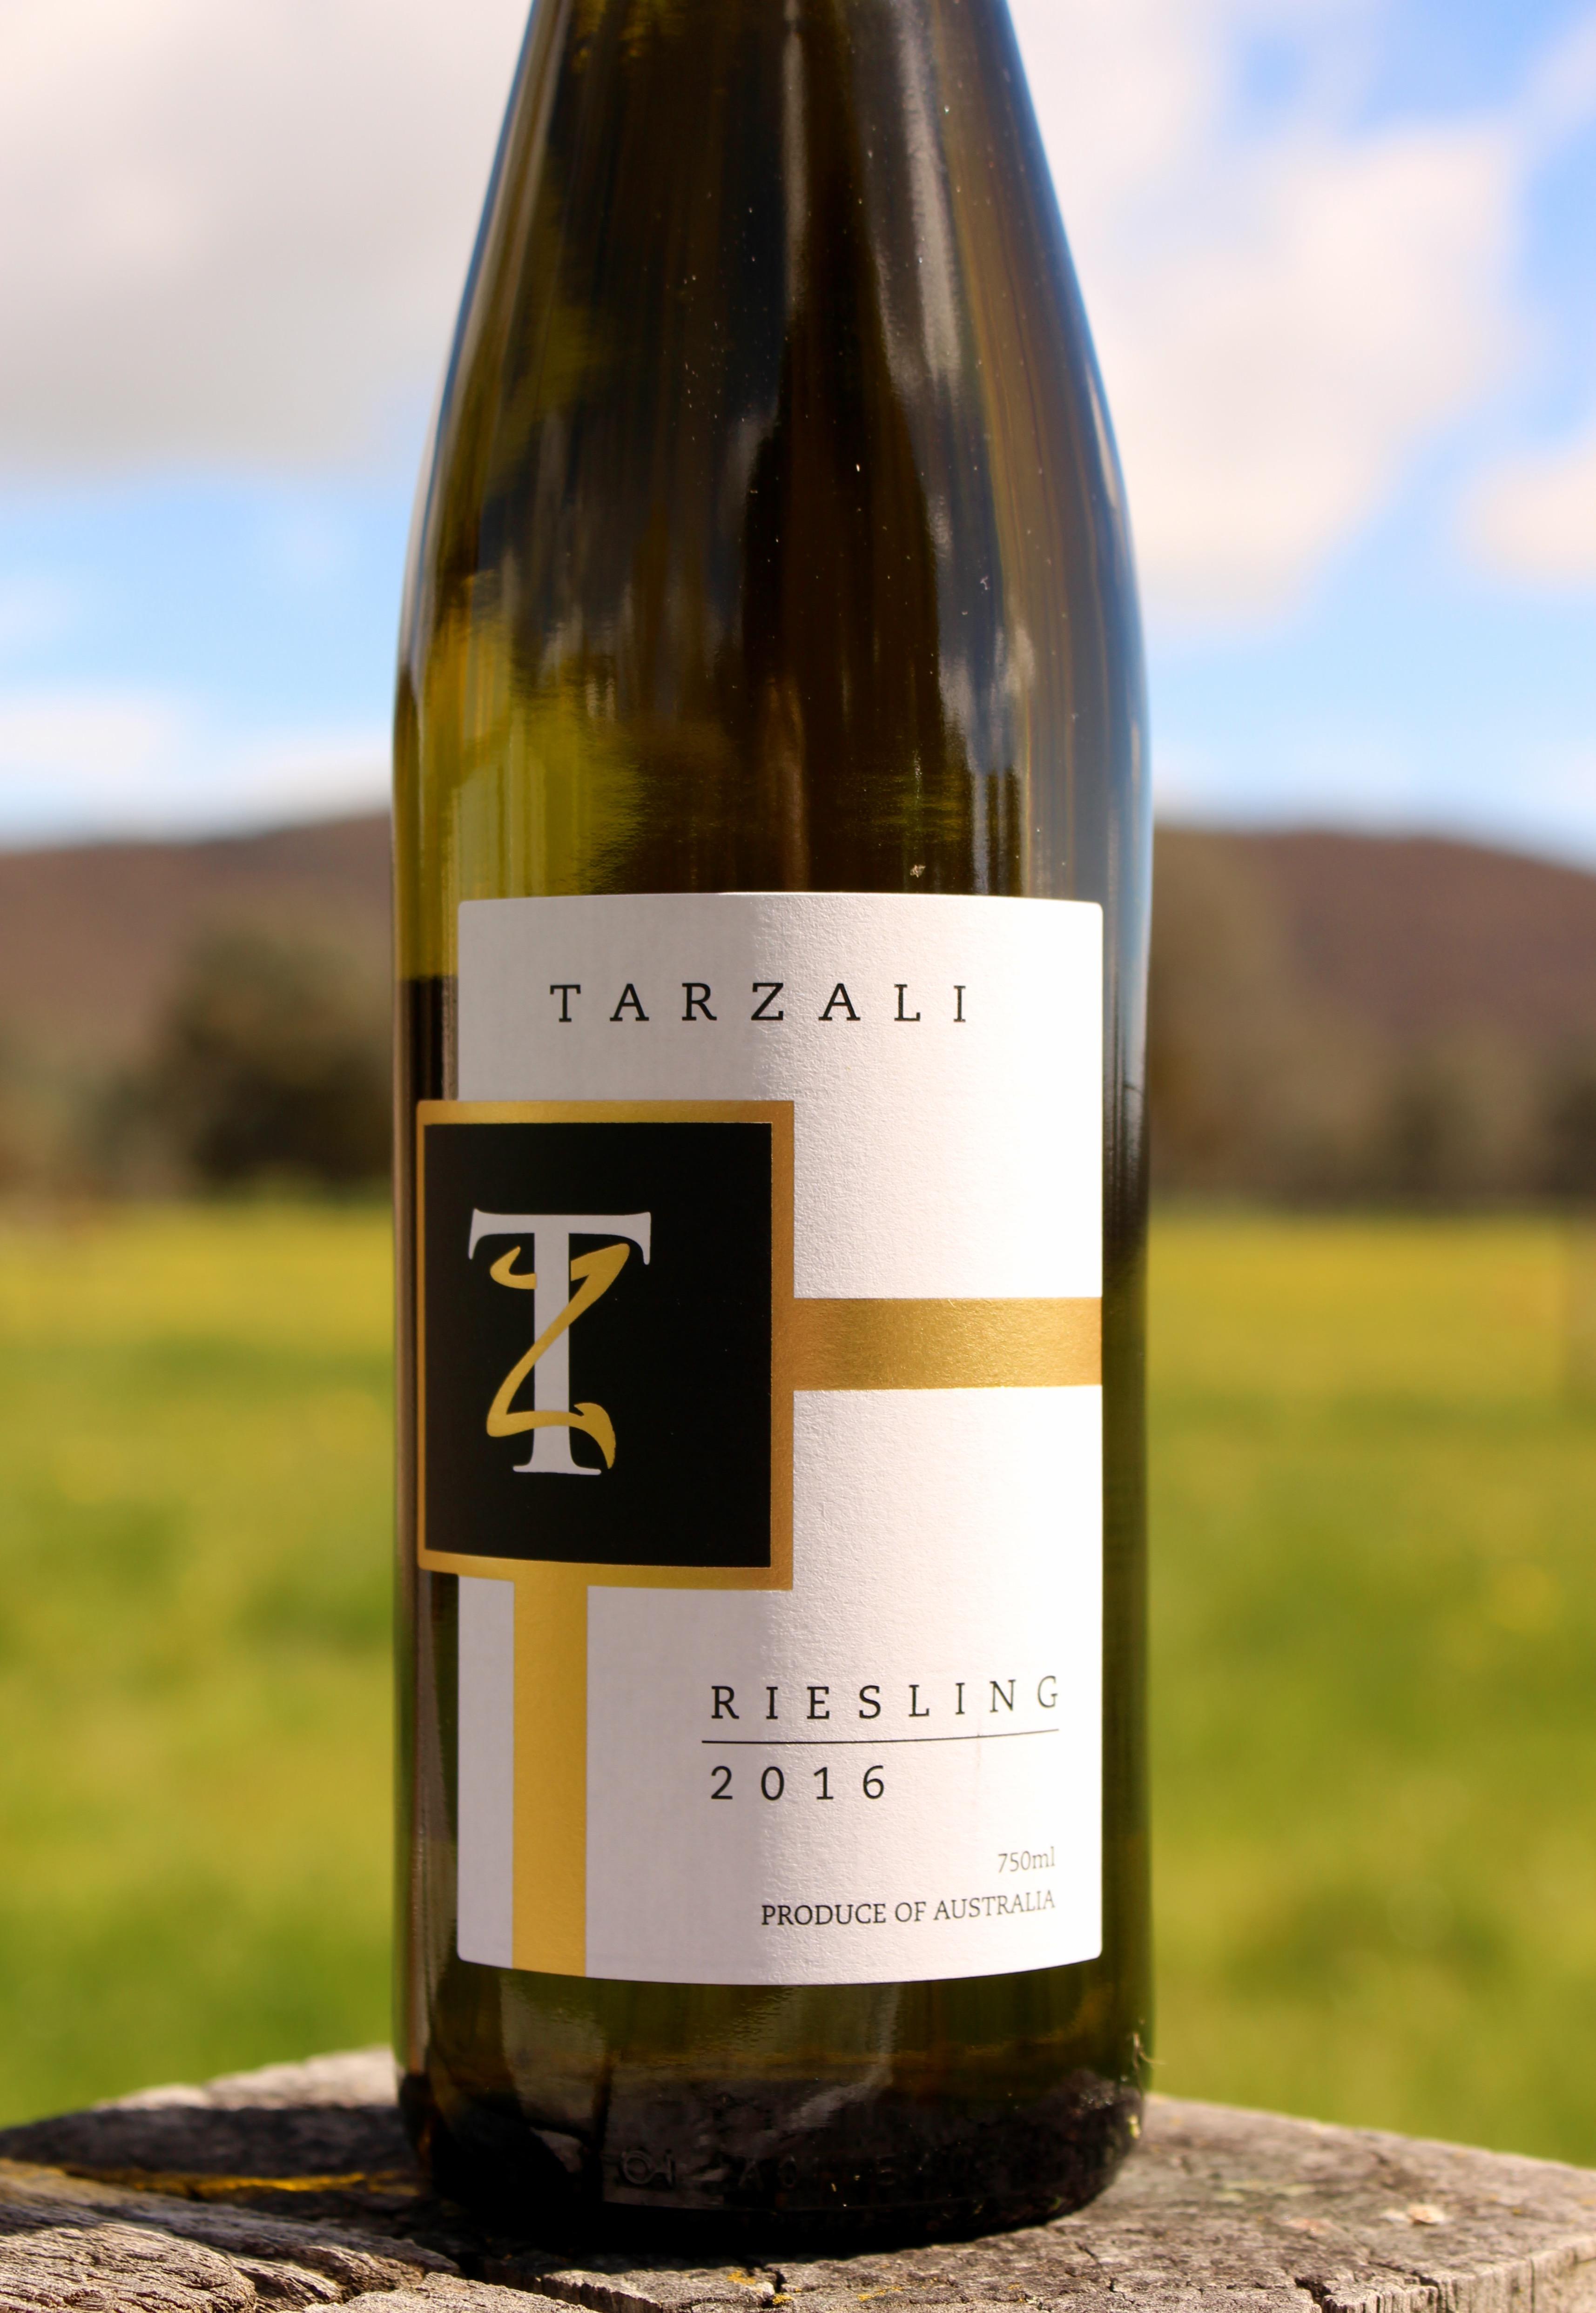 2016 Tarzali Riesling